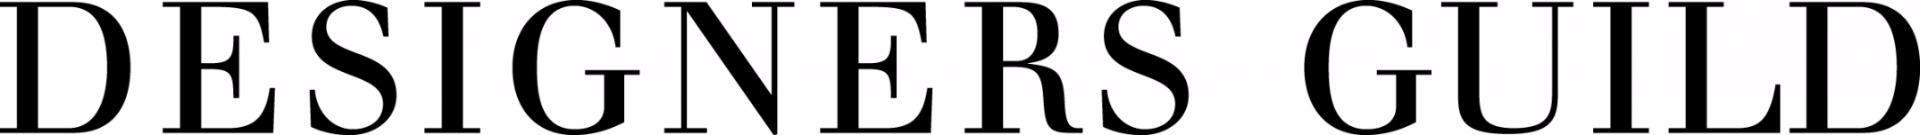 Designers Guild - Logo